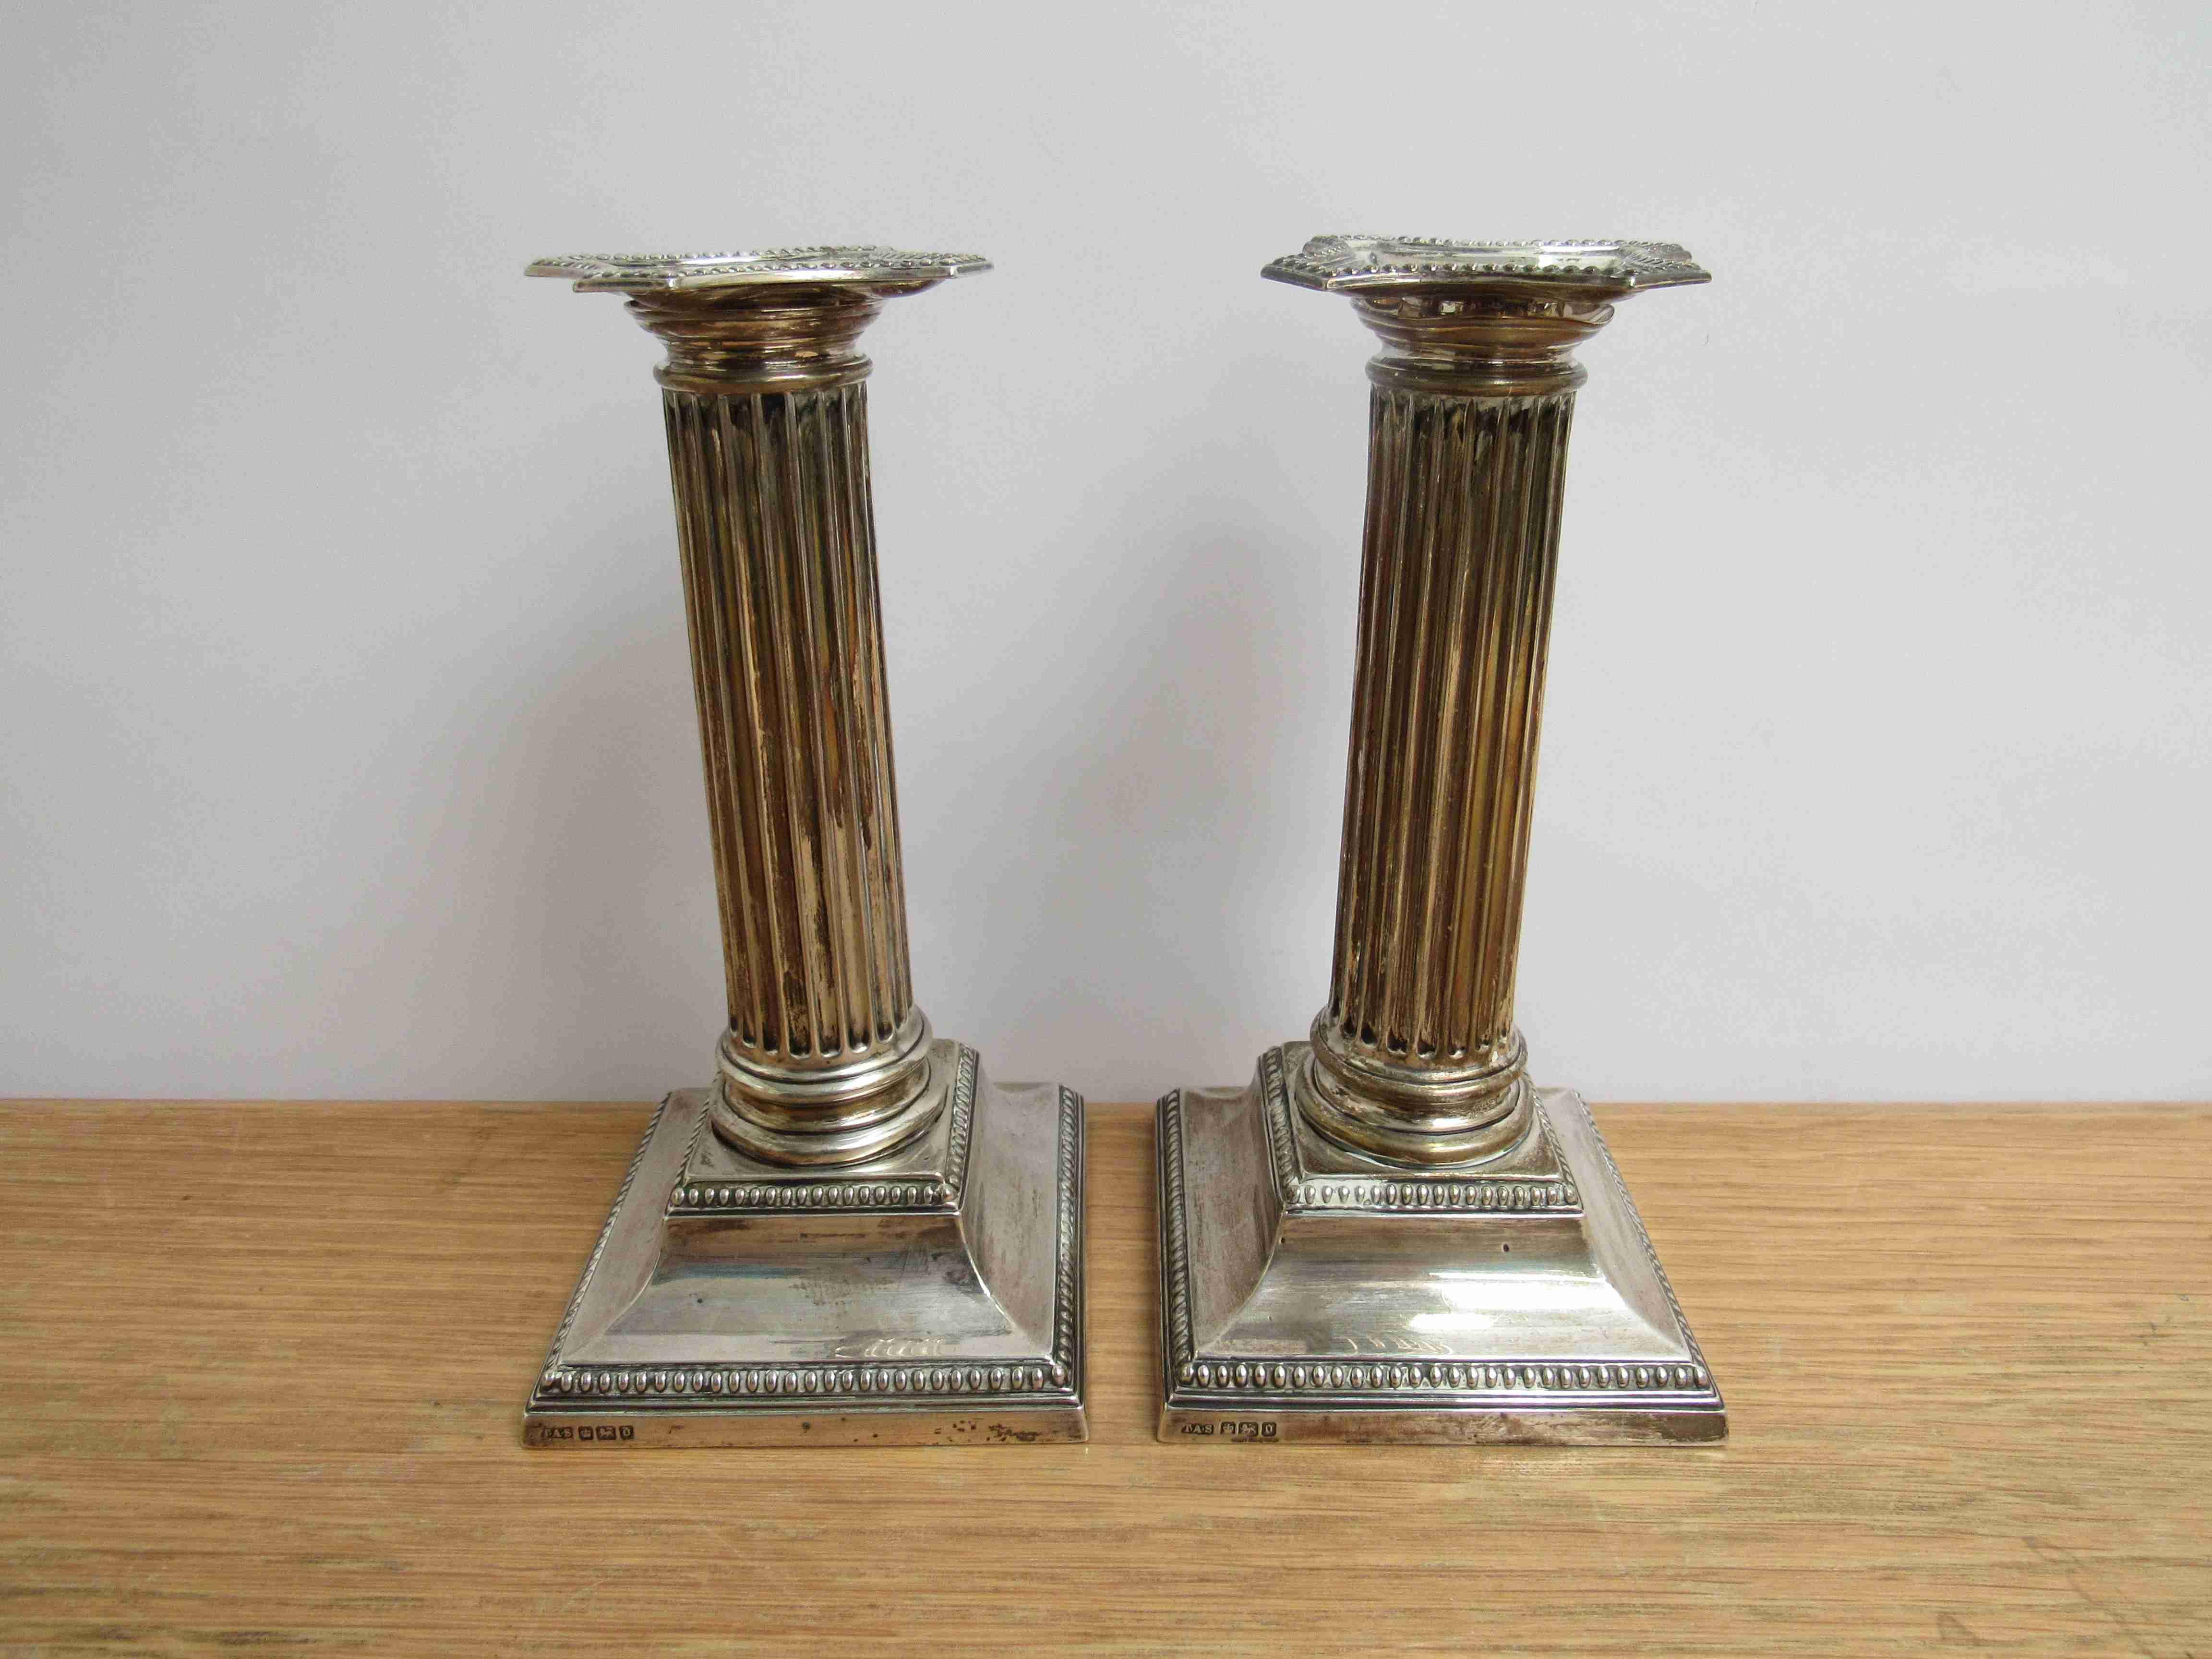 Lot 28 - A pair of Edwardian Thomas A Scott silver column candlesticks.